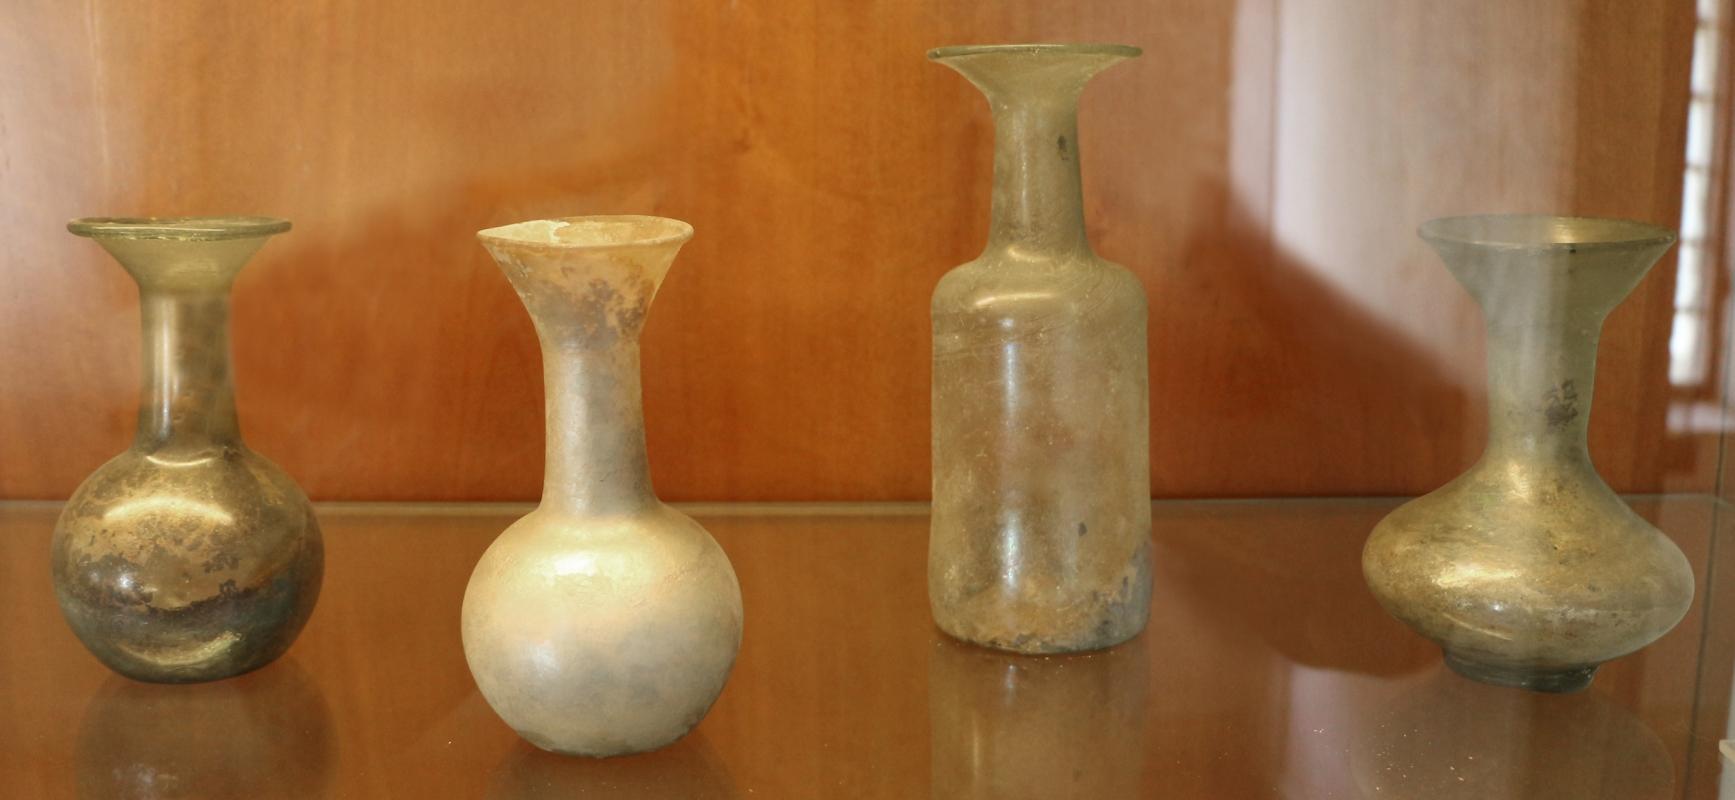 Fiaschette e balsamari in vetro, II-III secolo - Sailko - Ravenna (RA)